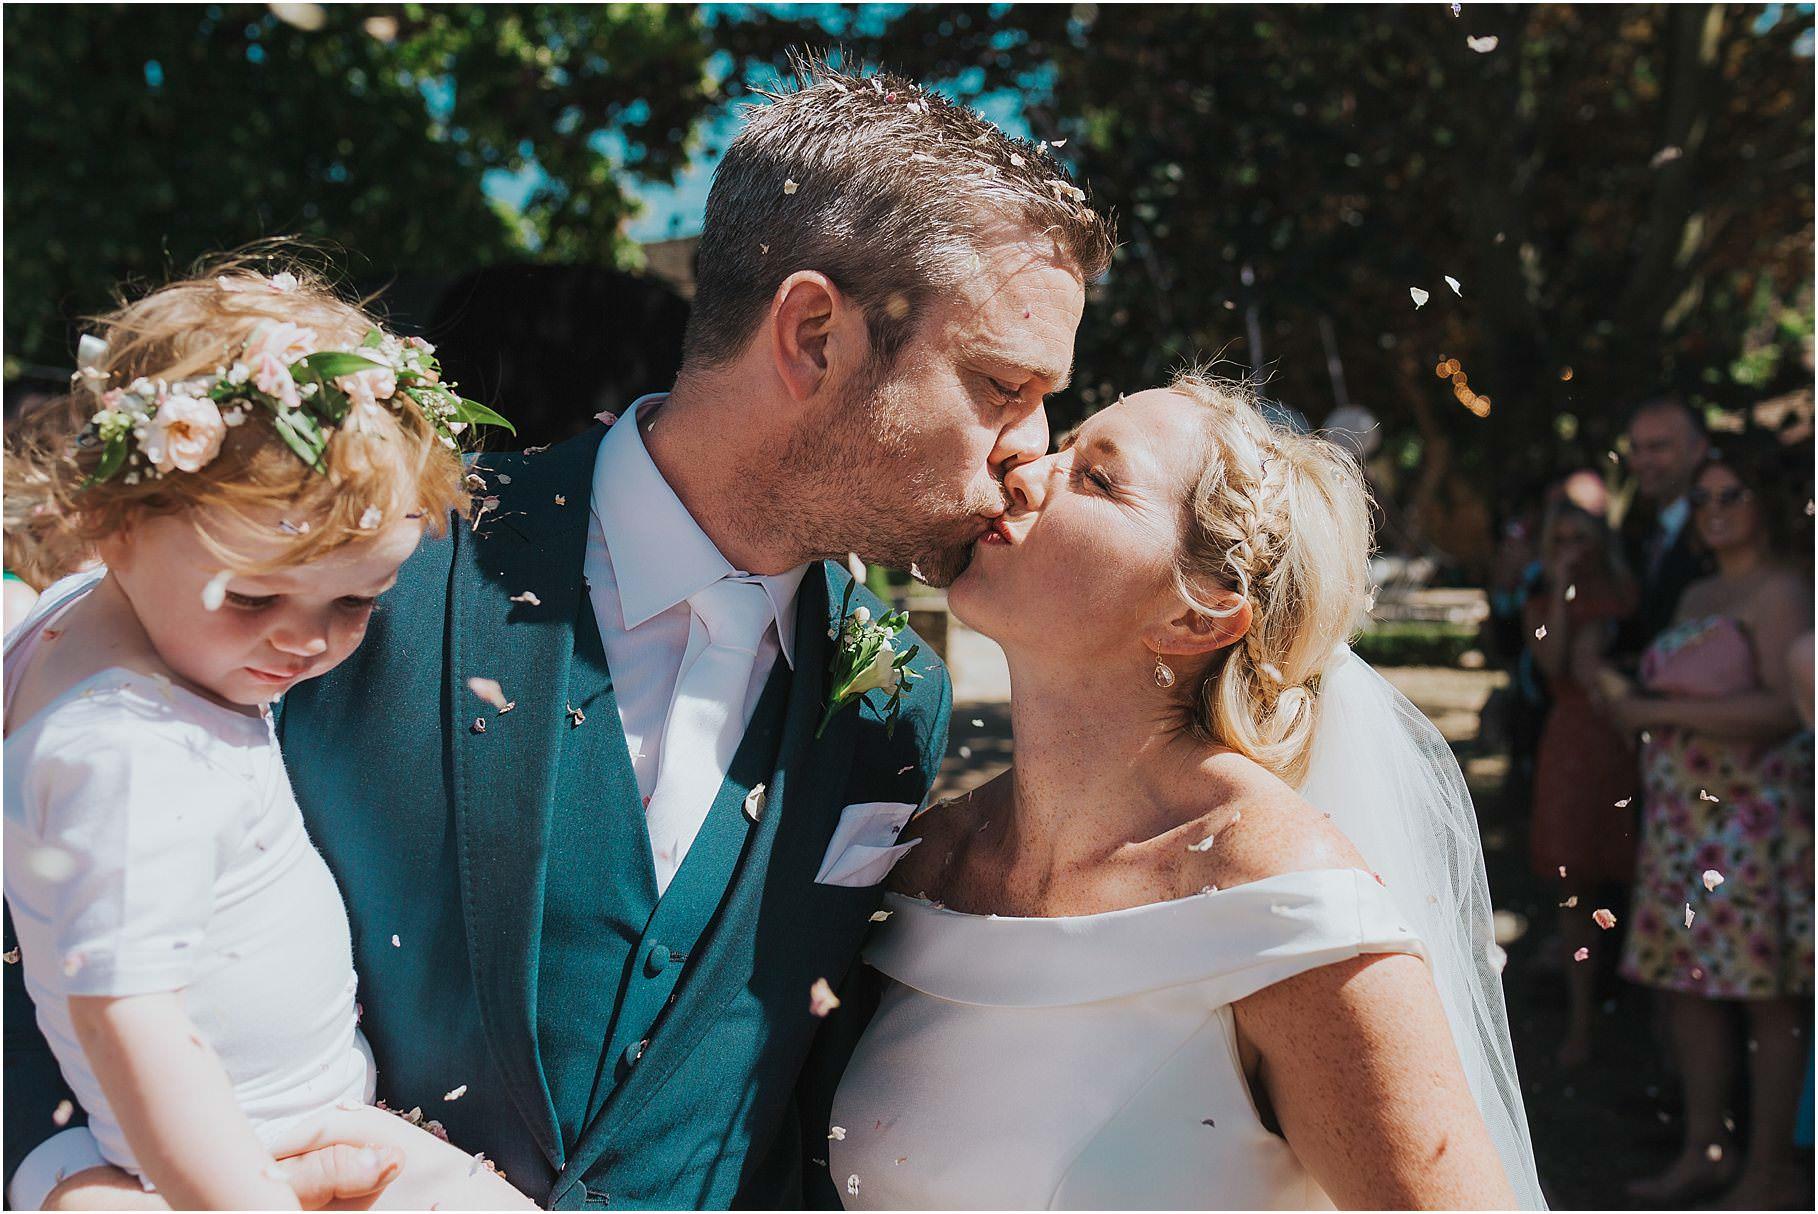 Cambridgeshire Wedding Photographer Black Horse Elton Wedding 1046 - Mr and Mrs Mac // CAMBRIDGESHIRE WEDDING